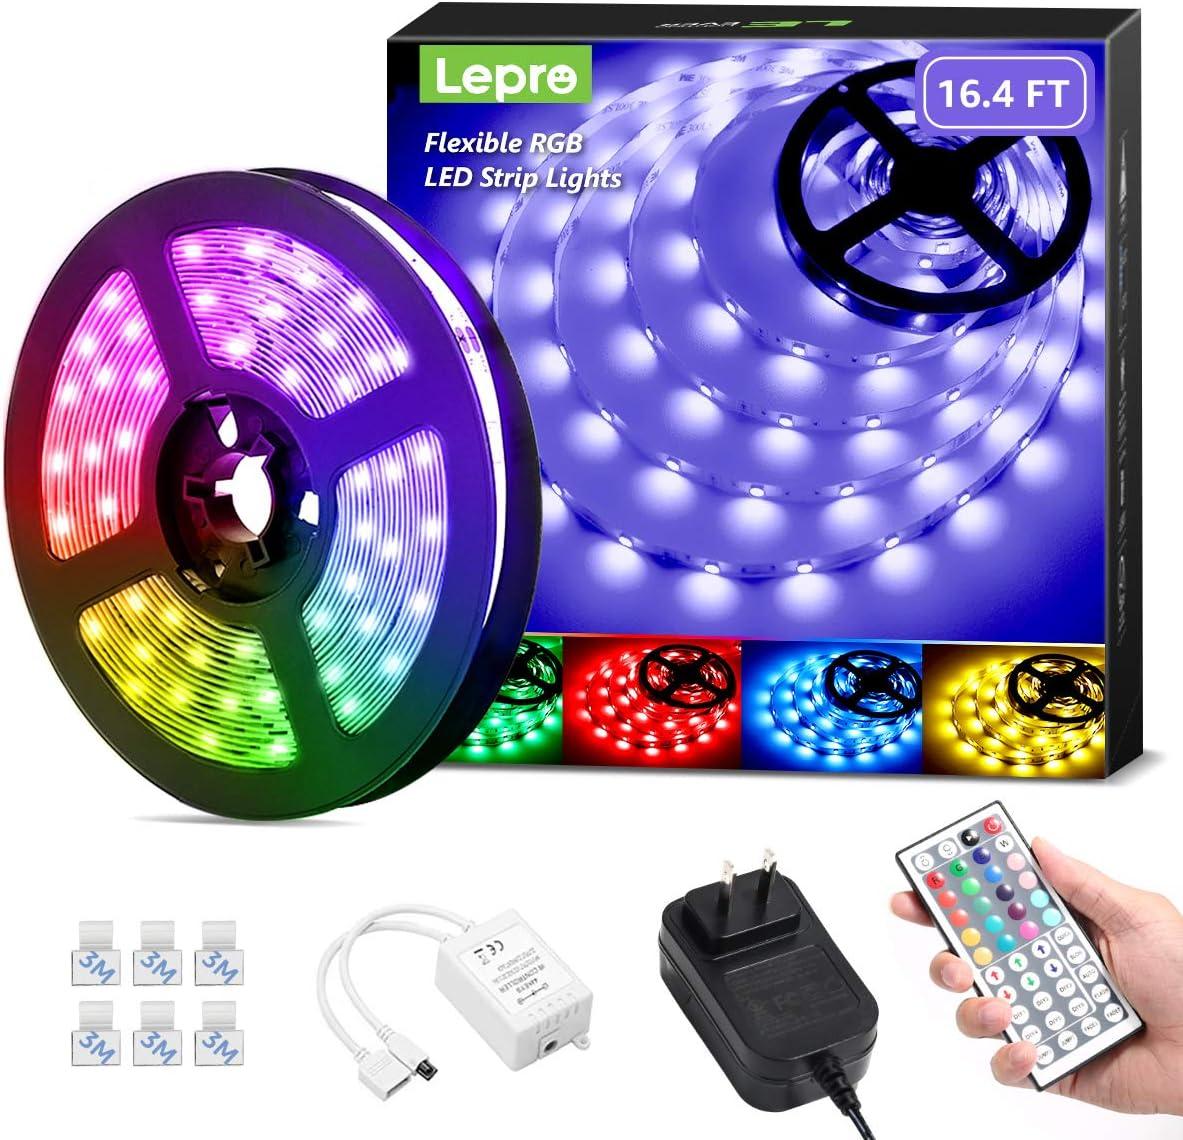 Lepro LED Strip Lights 16.4ft Brand Cheap Sale Venue 44 with Keys Los Angeles Mall RGB